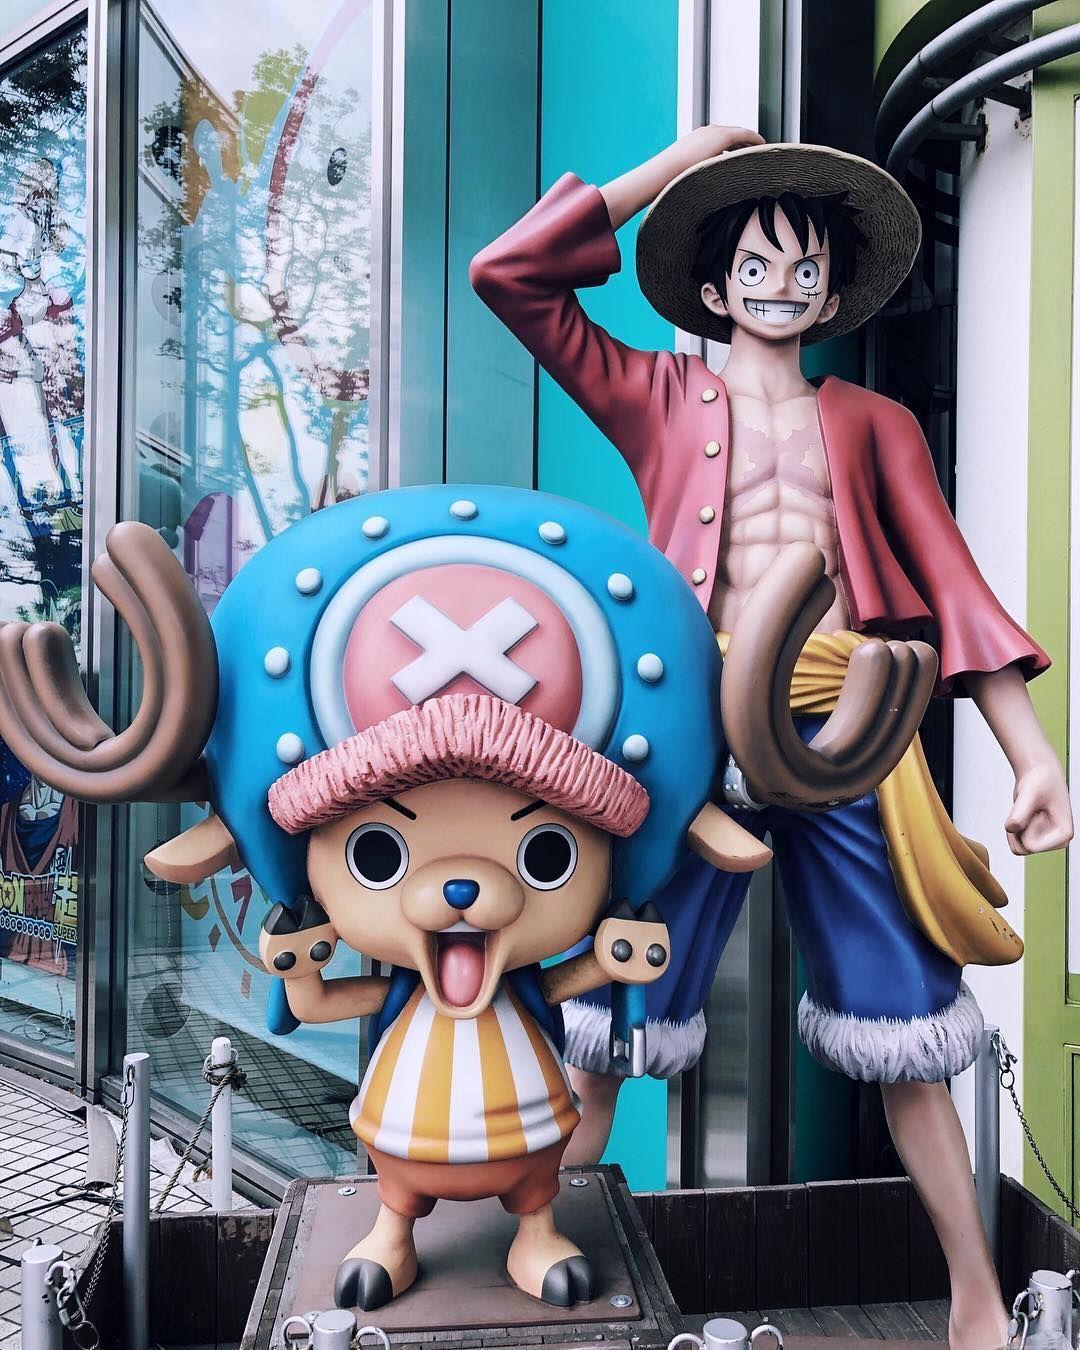 One Piece Fuji Tv Odaiba fujitv odaiba onepiece manga